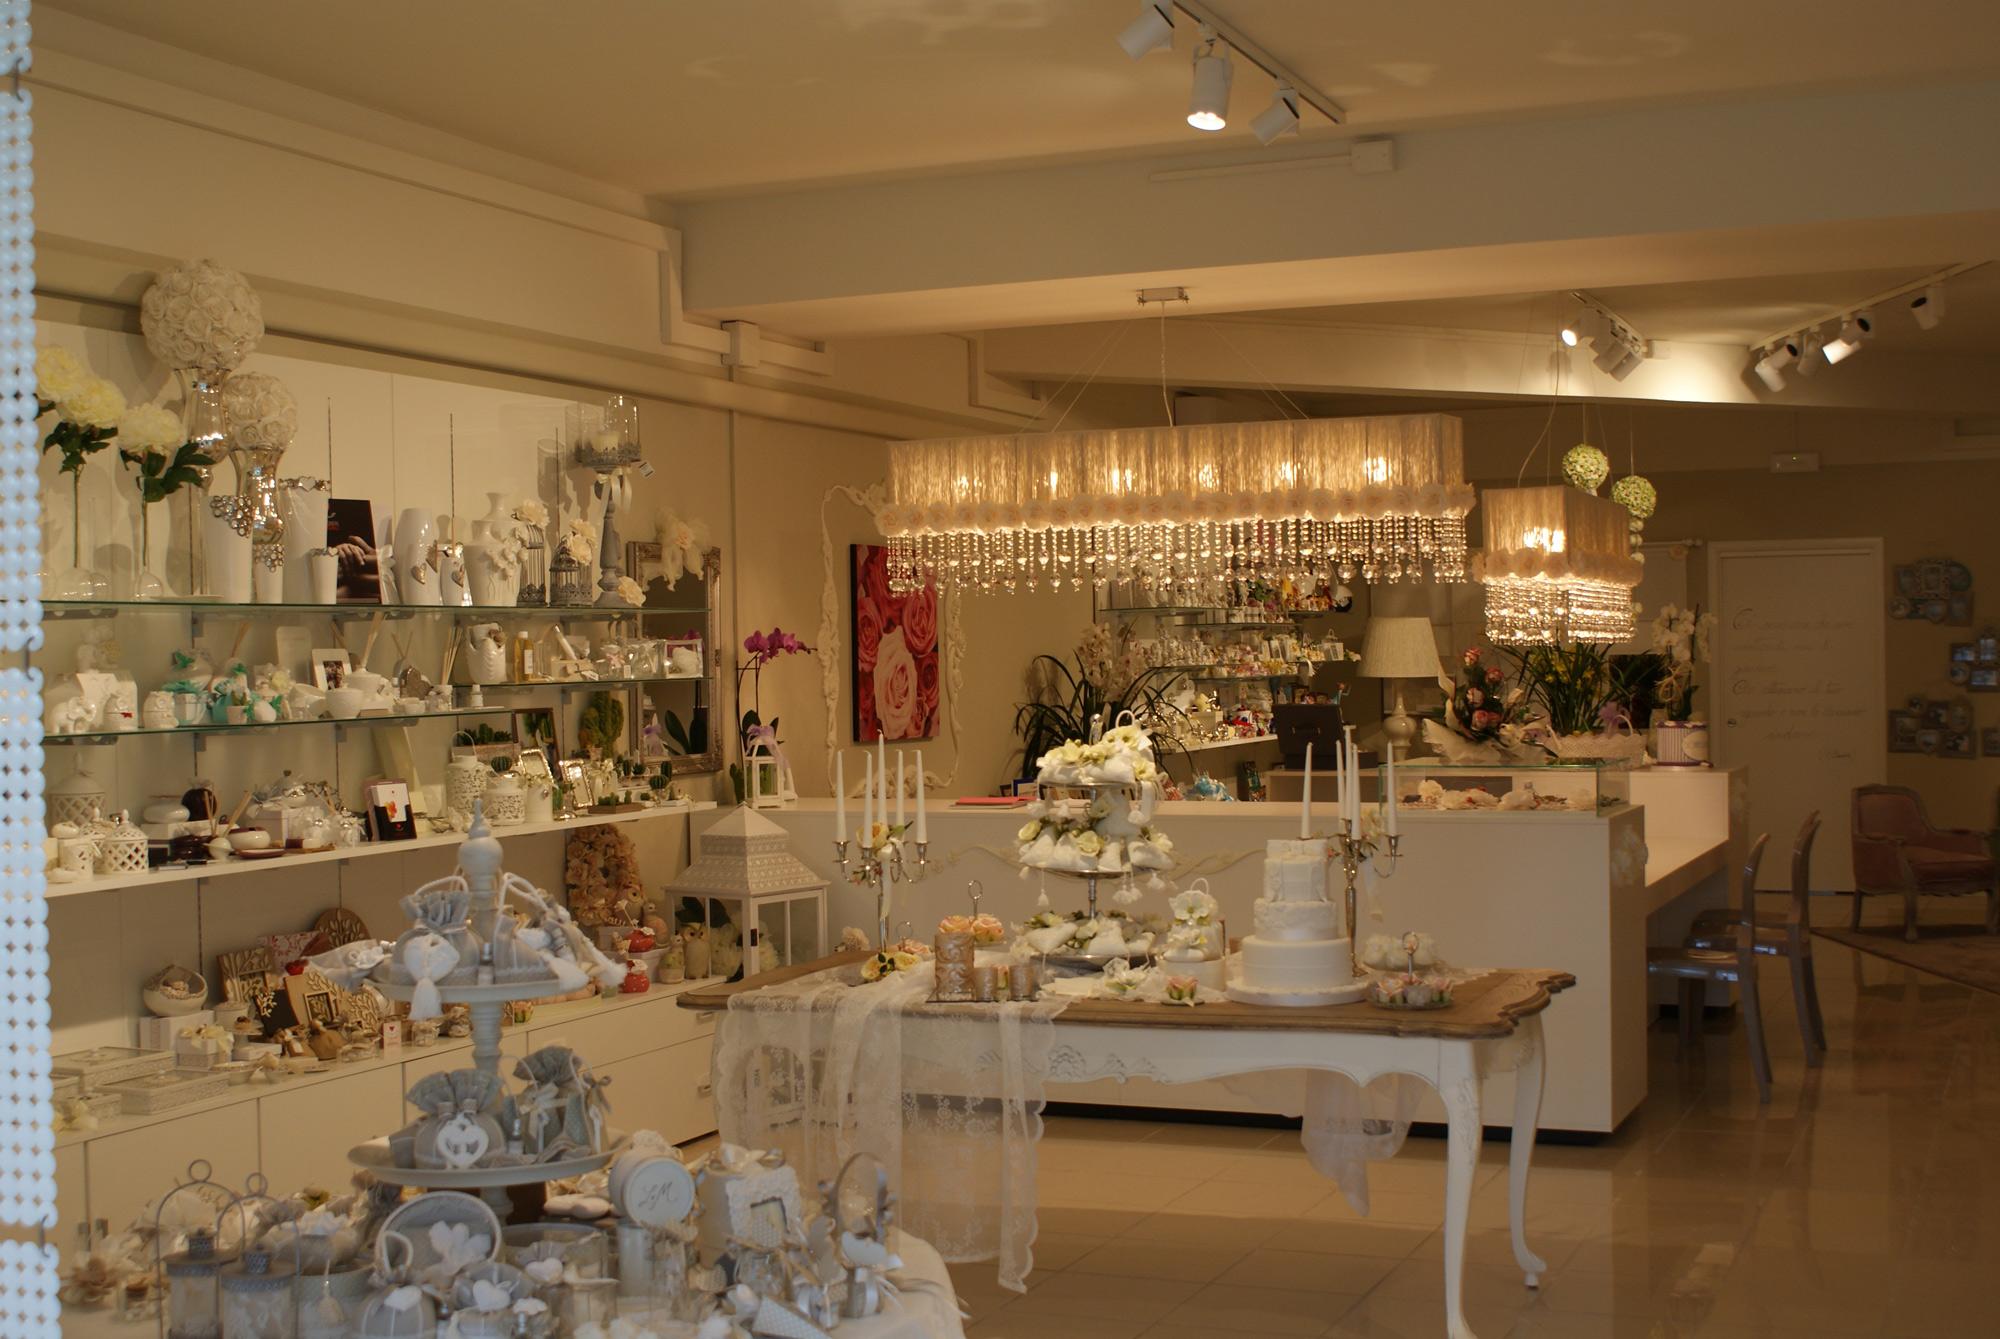 Arredamento per negozi di bomboniere toscana belardi for Arredamento